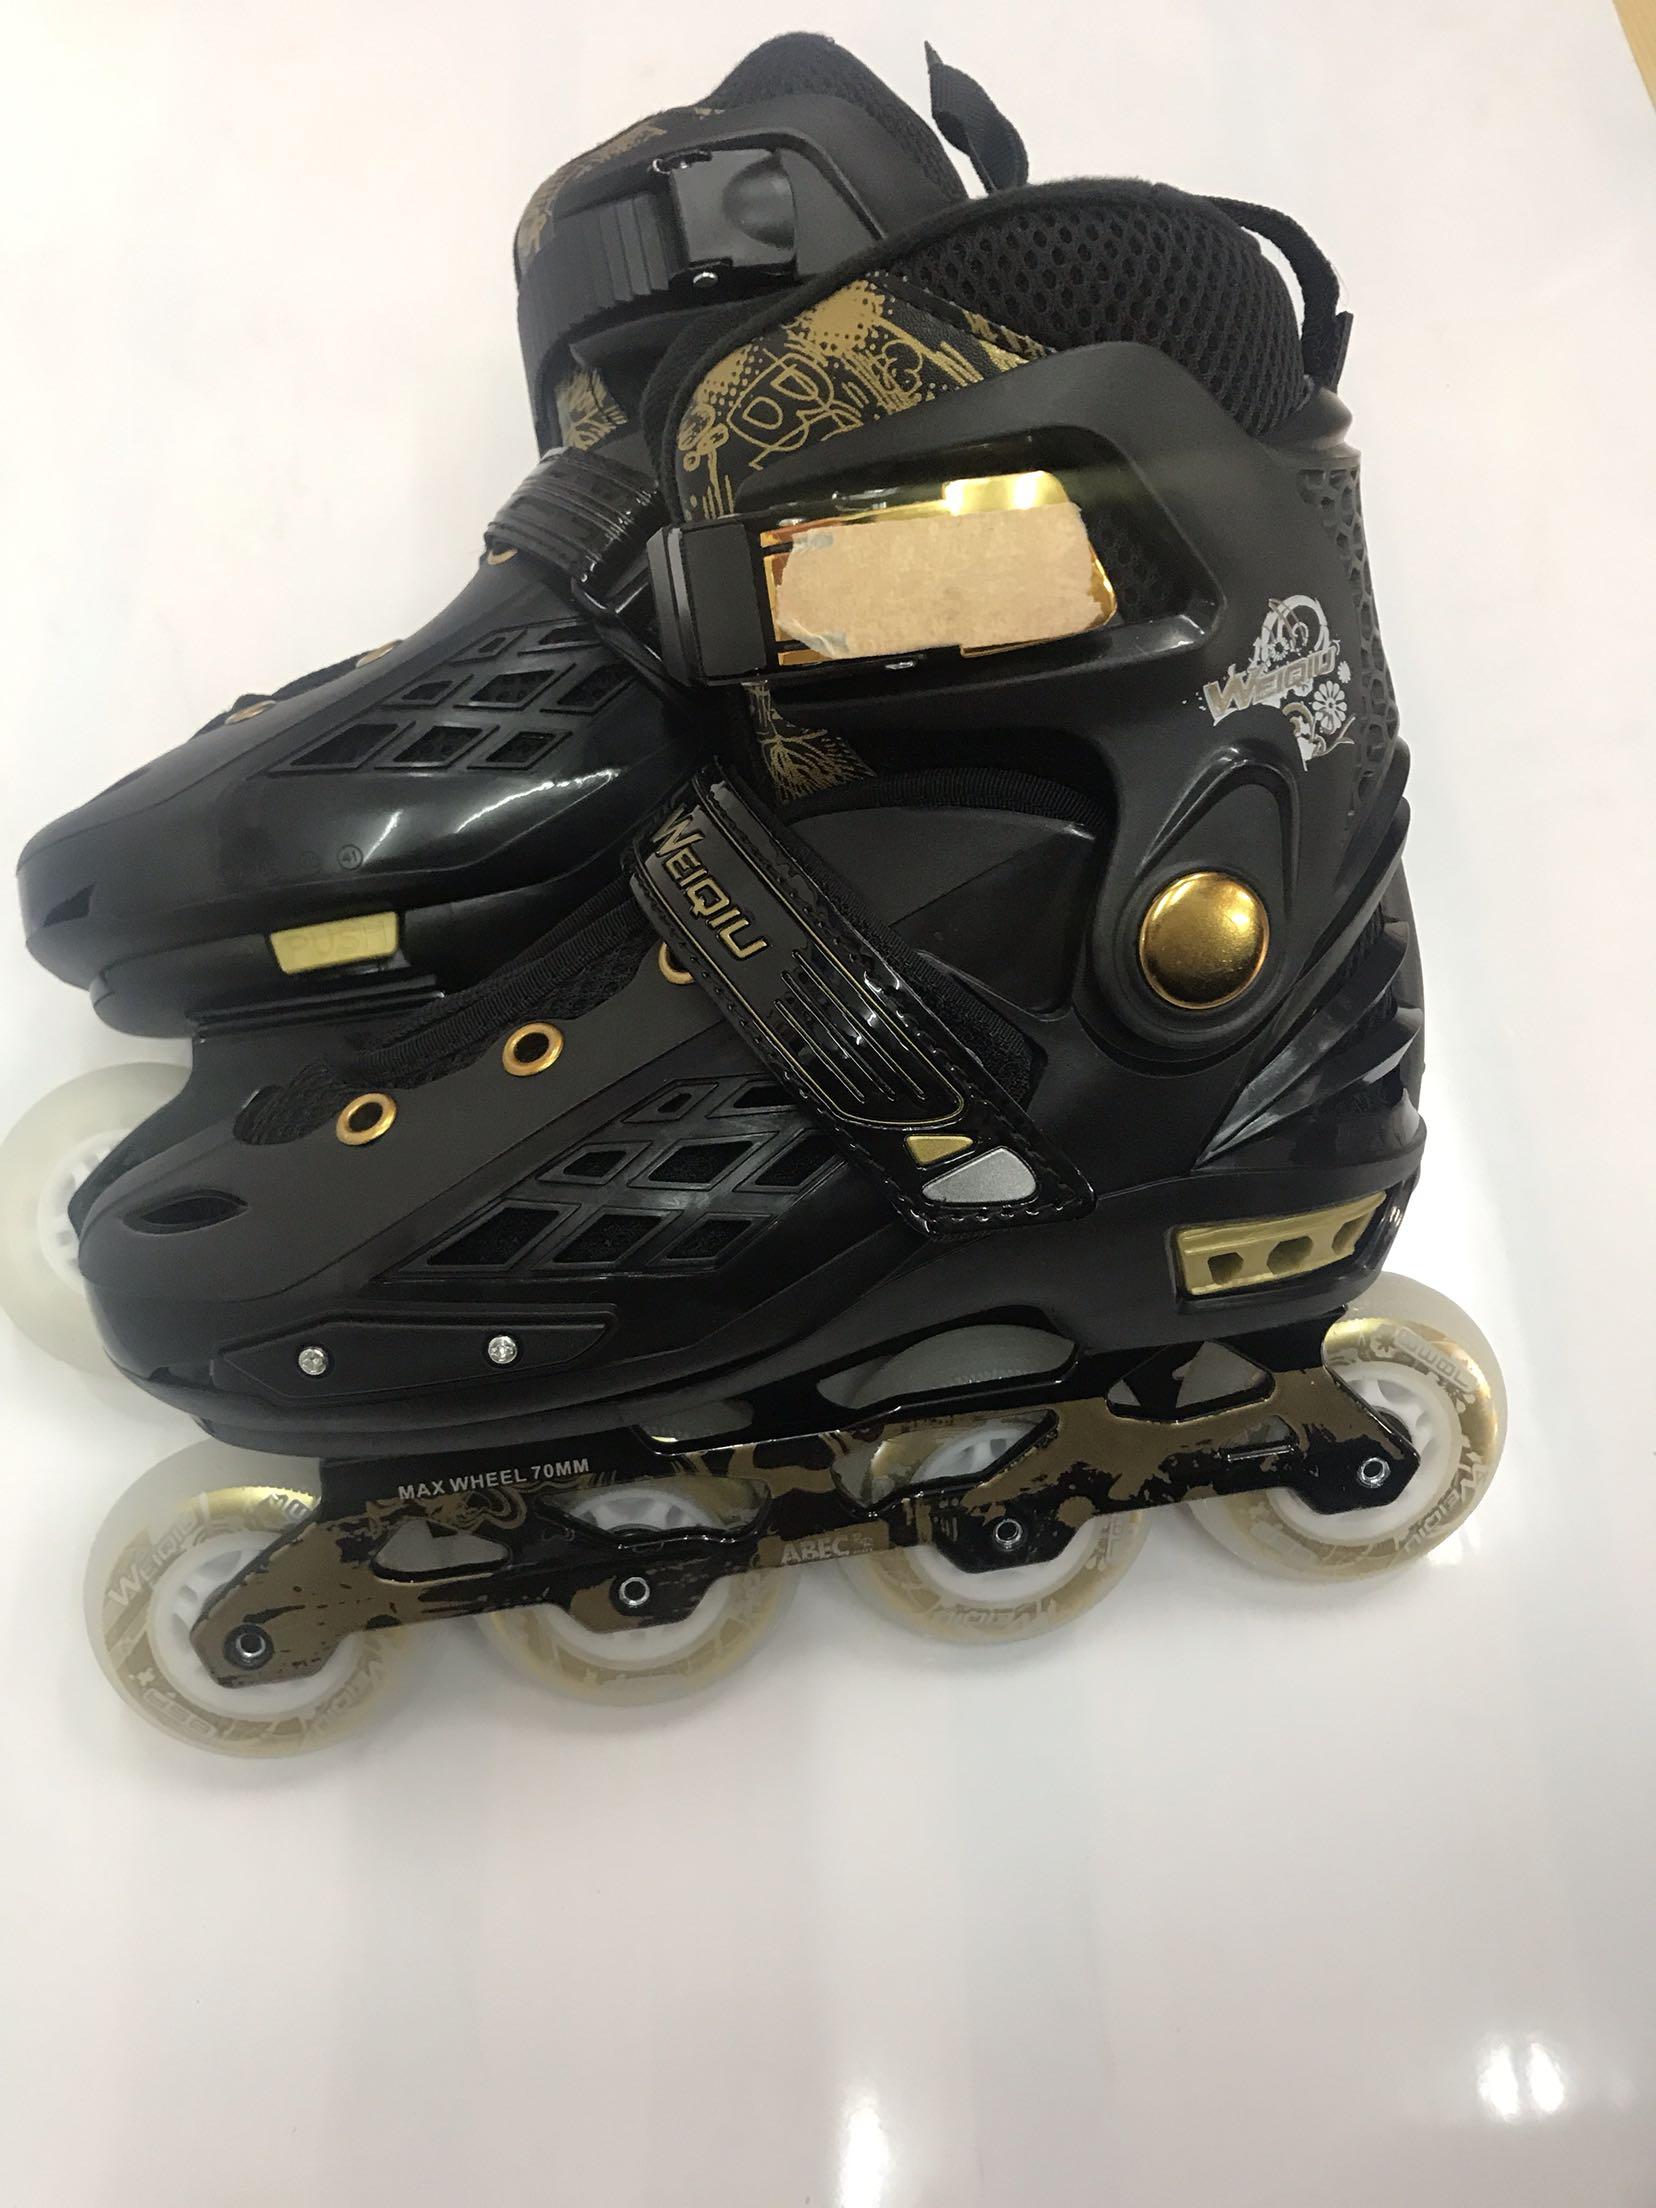 Weft ball professional adjustable flat skates skates adult straight row roller skates children roller skates single full flash